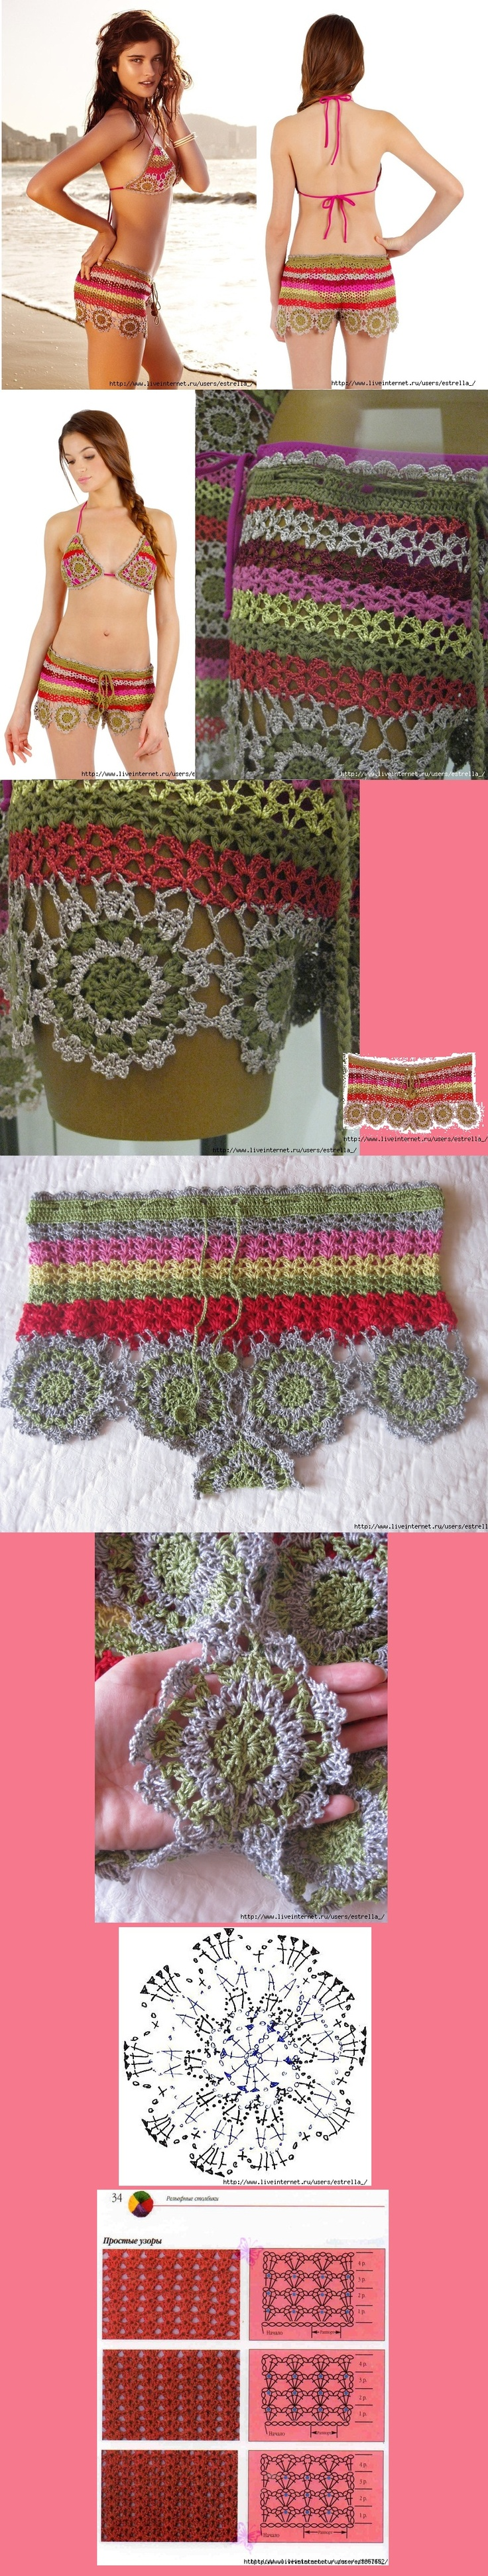 crochet shorty